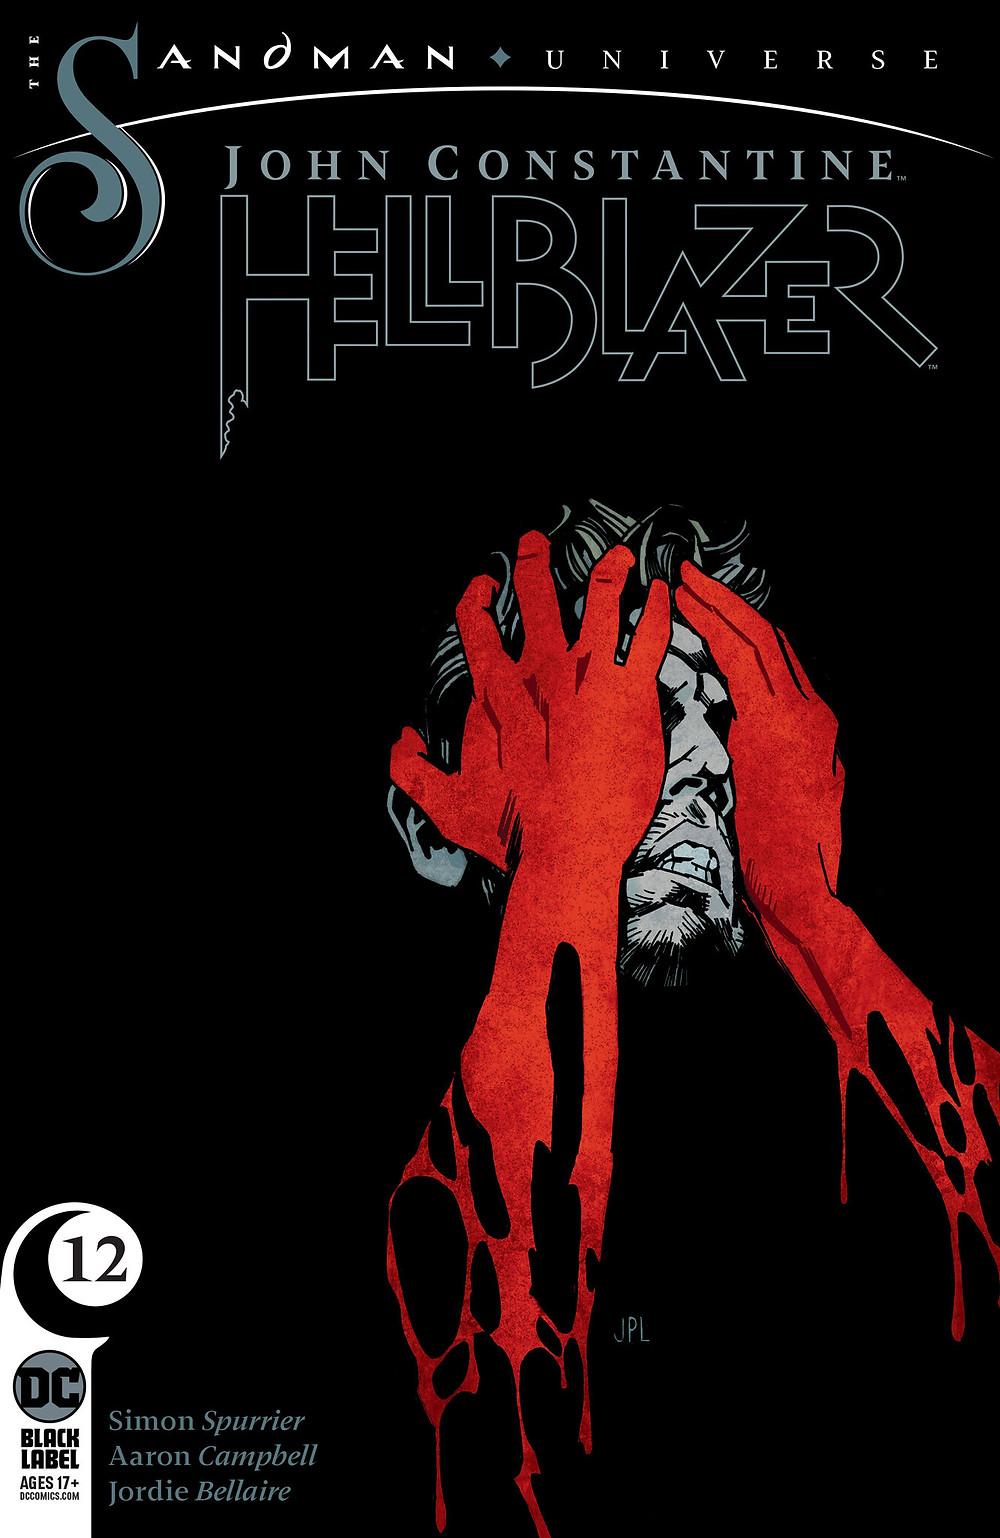 John Constantine: Hellblazer, issue #12, cover, DC Comics, John Paul Leon